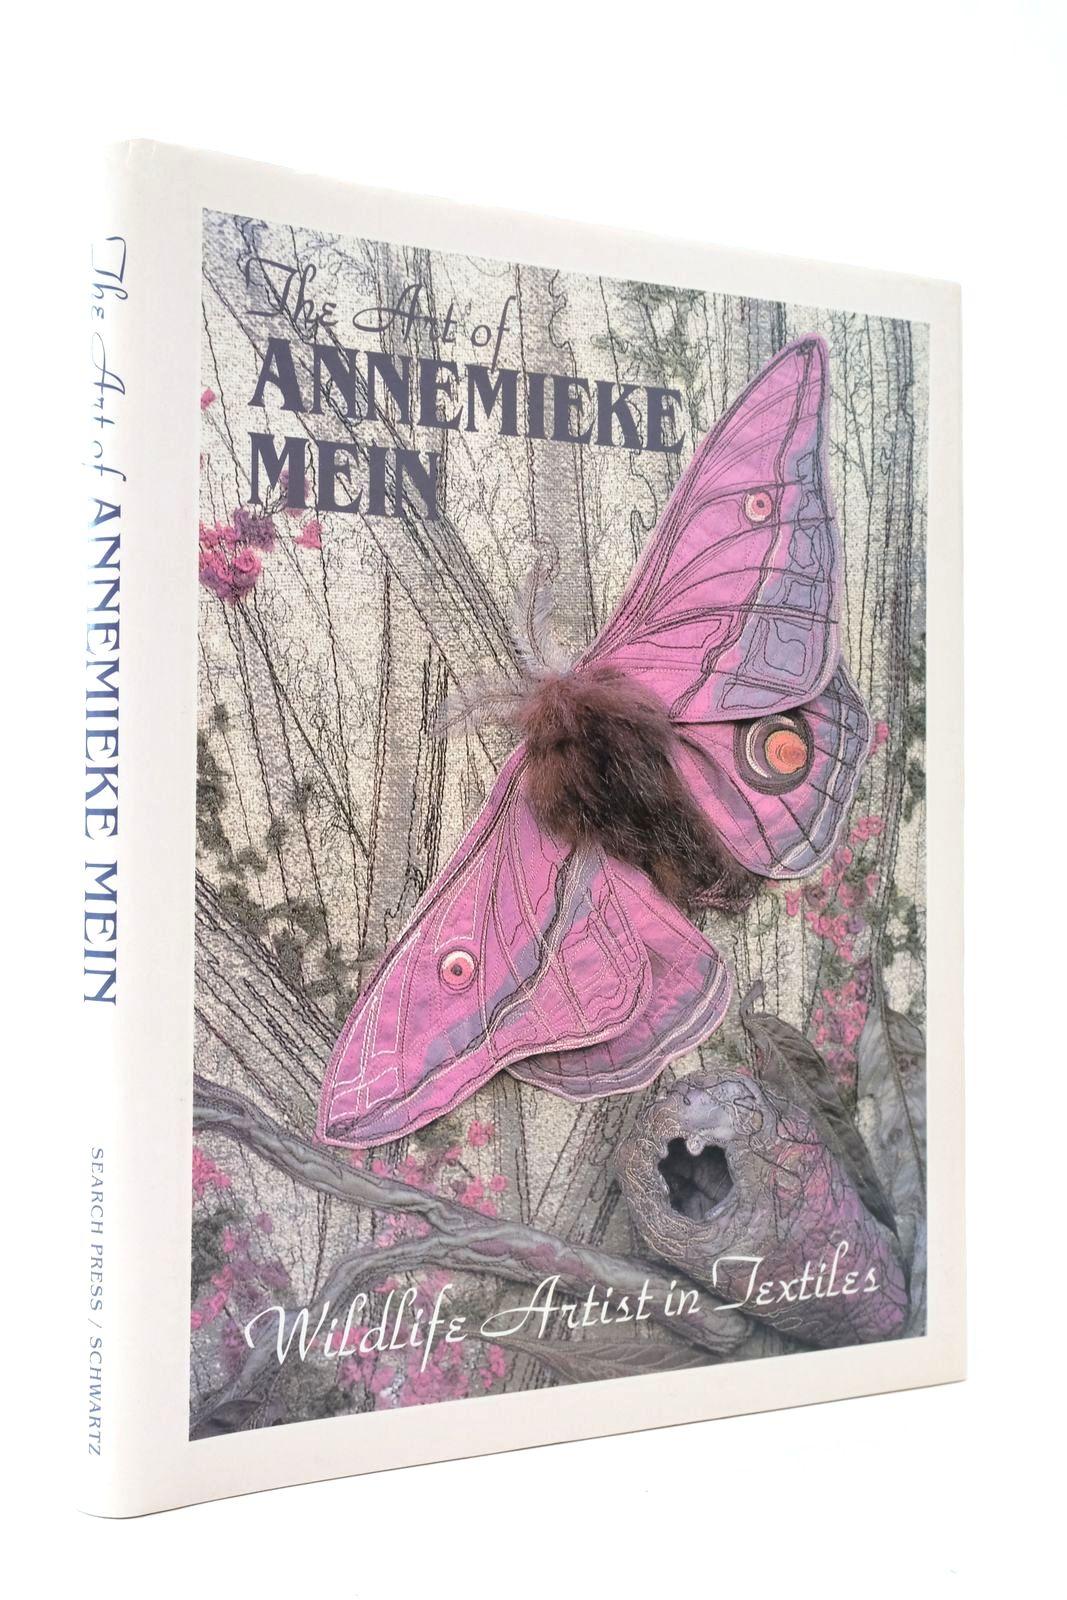 Photo of THE ART OF ANNEMIEKE MEIN WILDLIFE ARTIST IN TEXTILES- Stock Number: 2134826